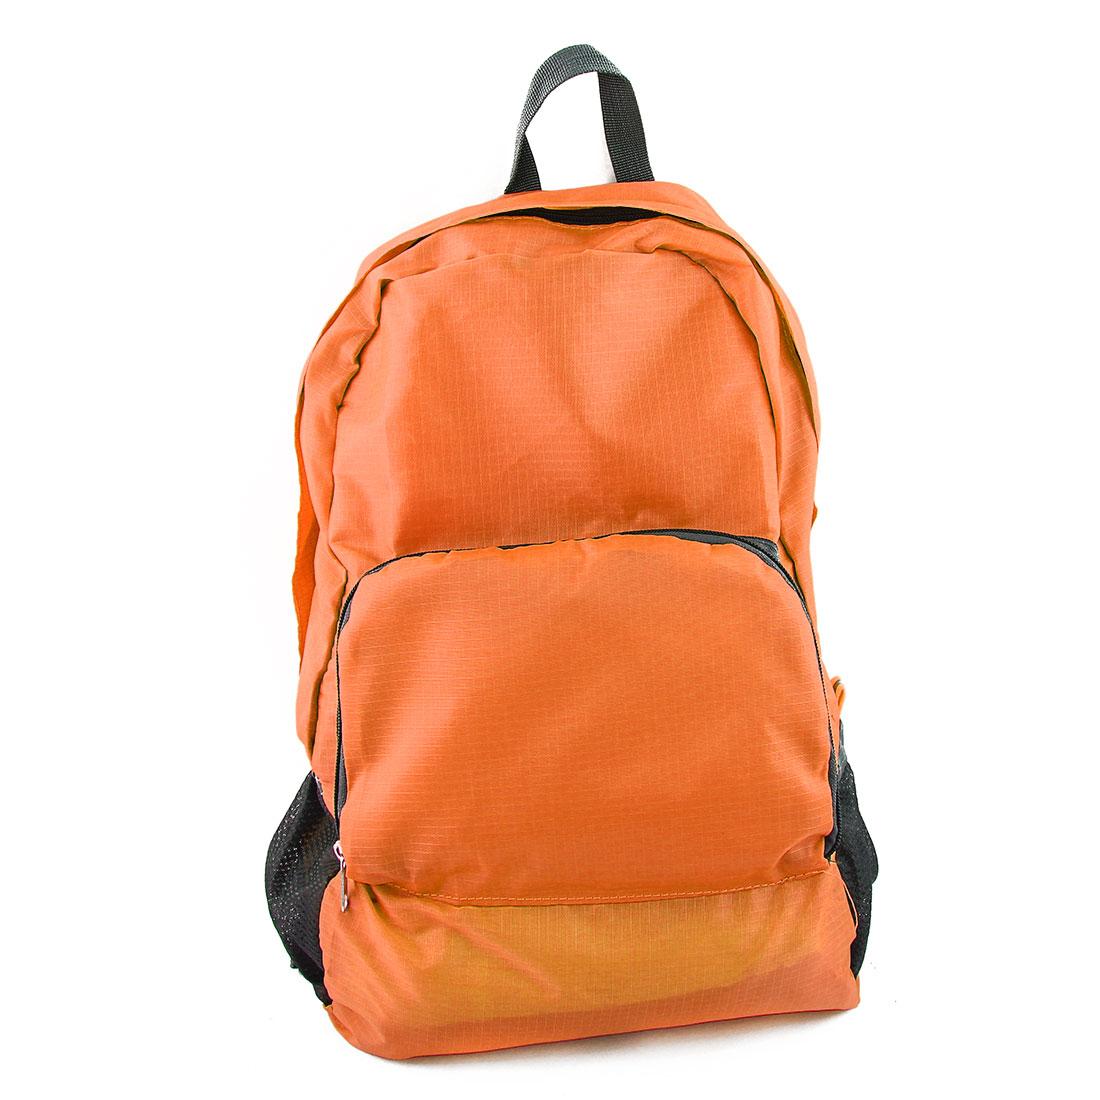 Lightweight Packable Pack Outdoor Travel Backpack Hiking Camping Daypack Sport Bag Orange 20L